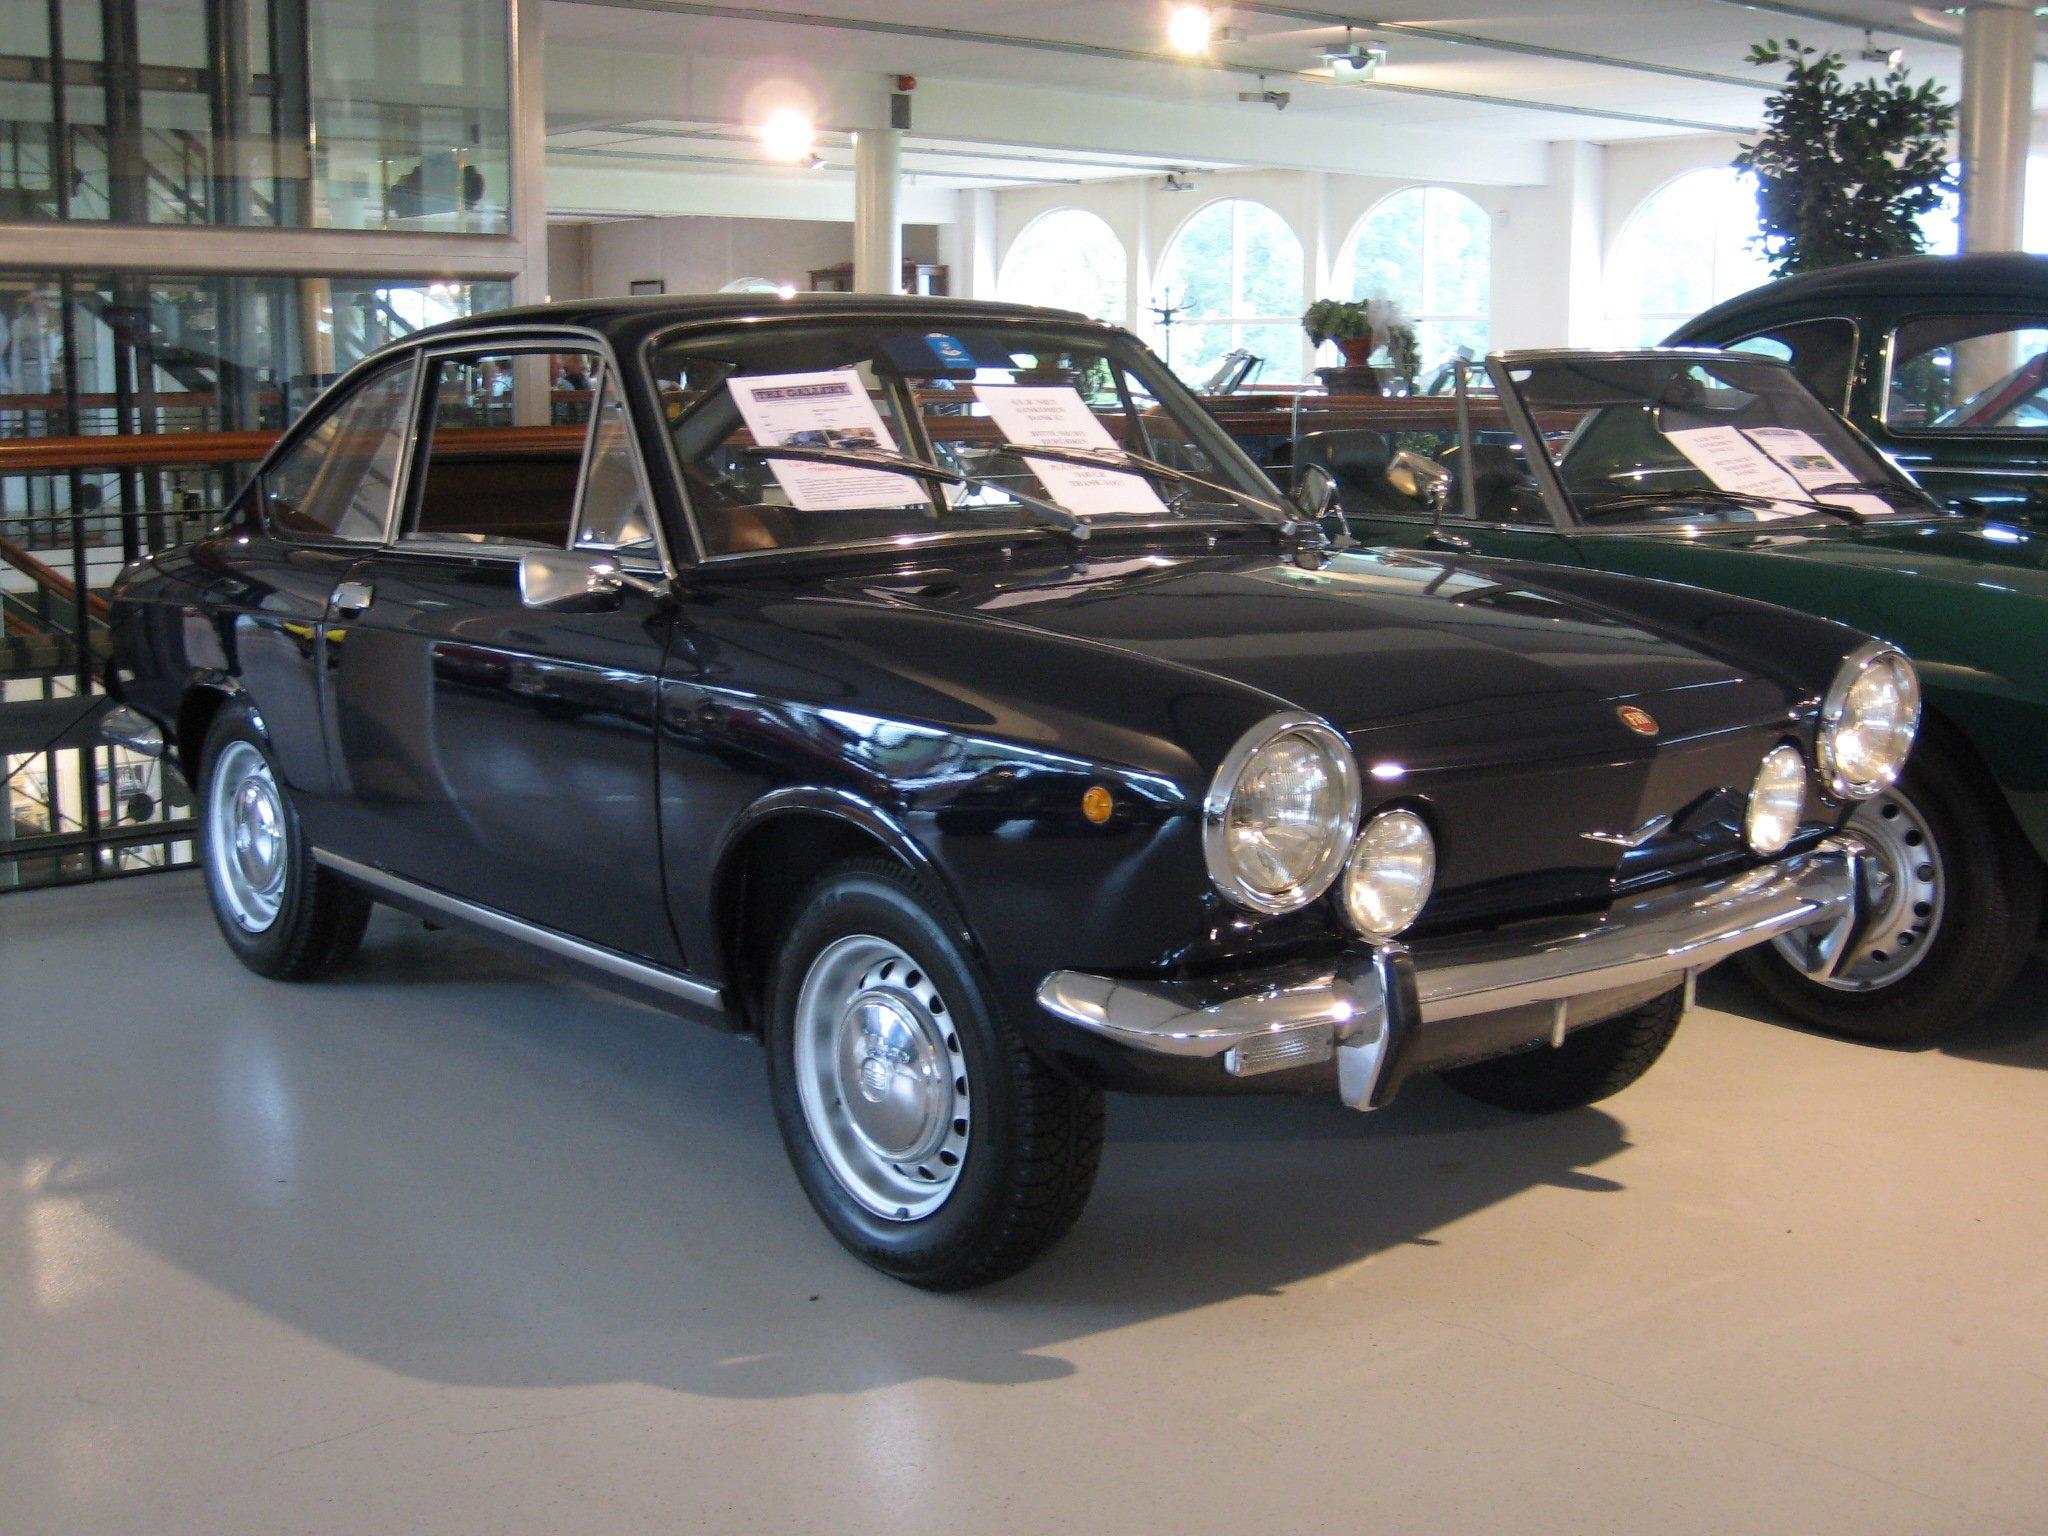 fiat 850 sport coupe classic cars italia wallpaper 2048x1536 604113 wallpaperup. Black Bedroom Furniture Sets. Home Design Ideas